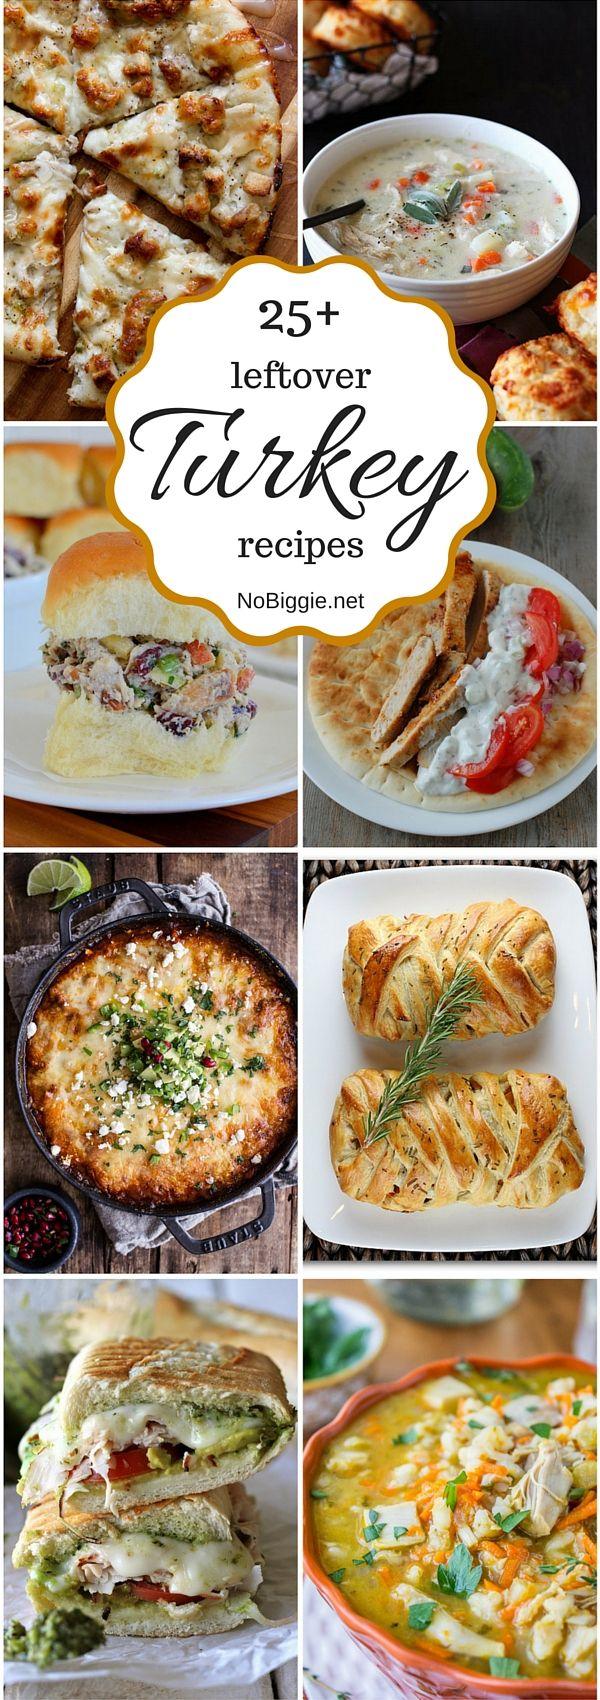 25+ leftover turkey recipes- NoBiggie.net